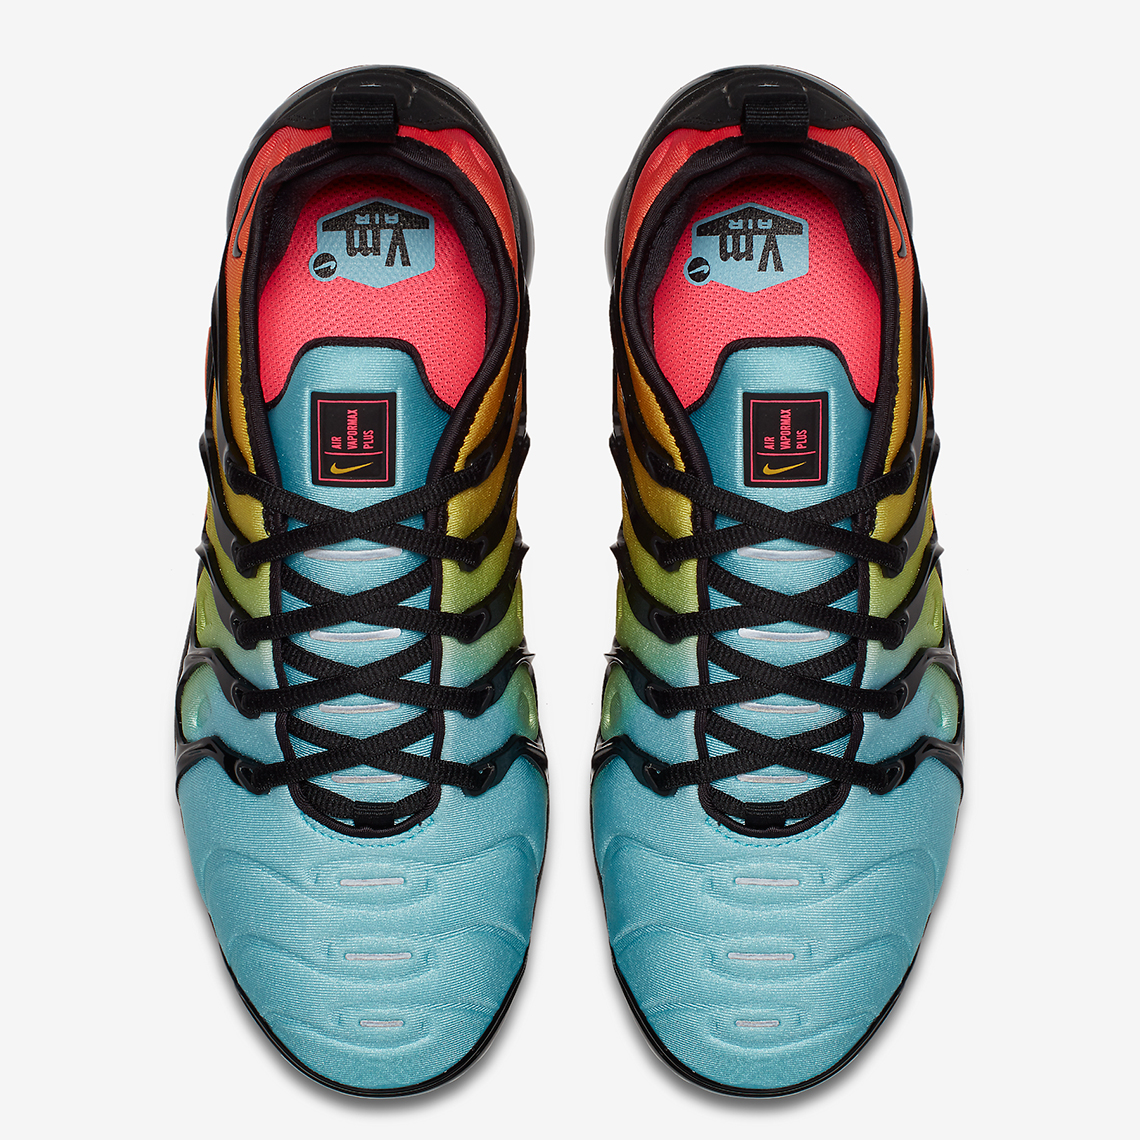 e481a91918 Nike Vapormax Plus